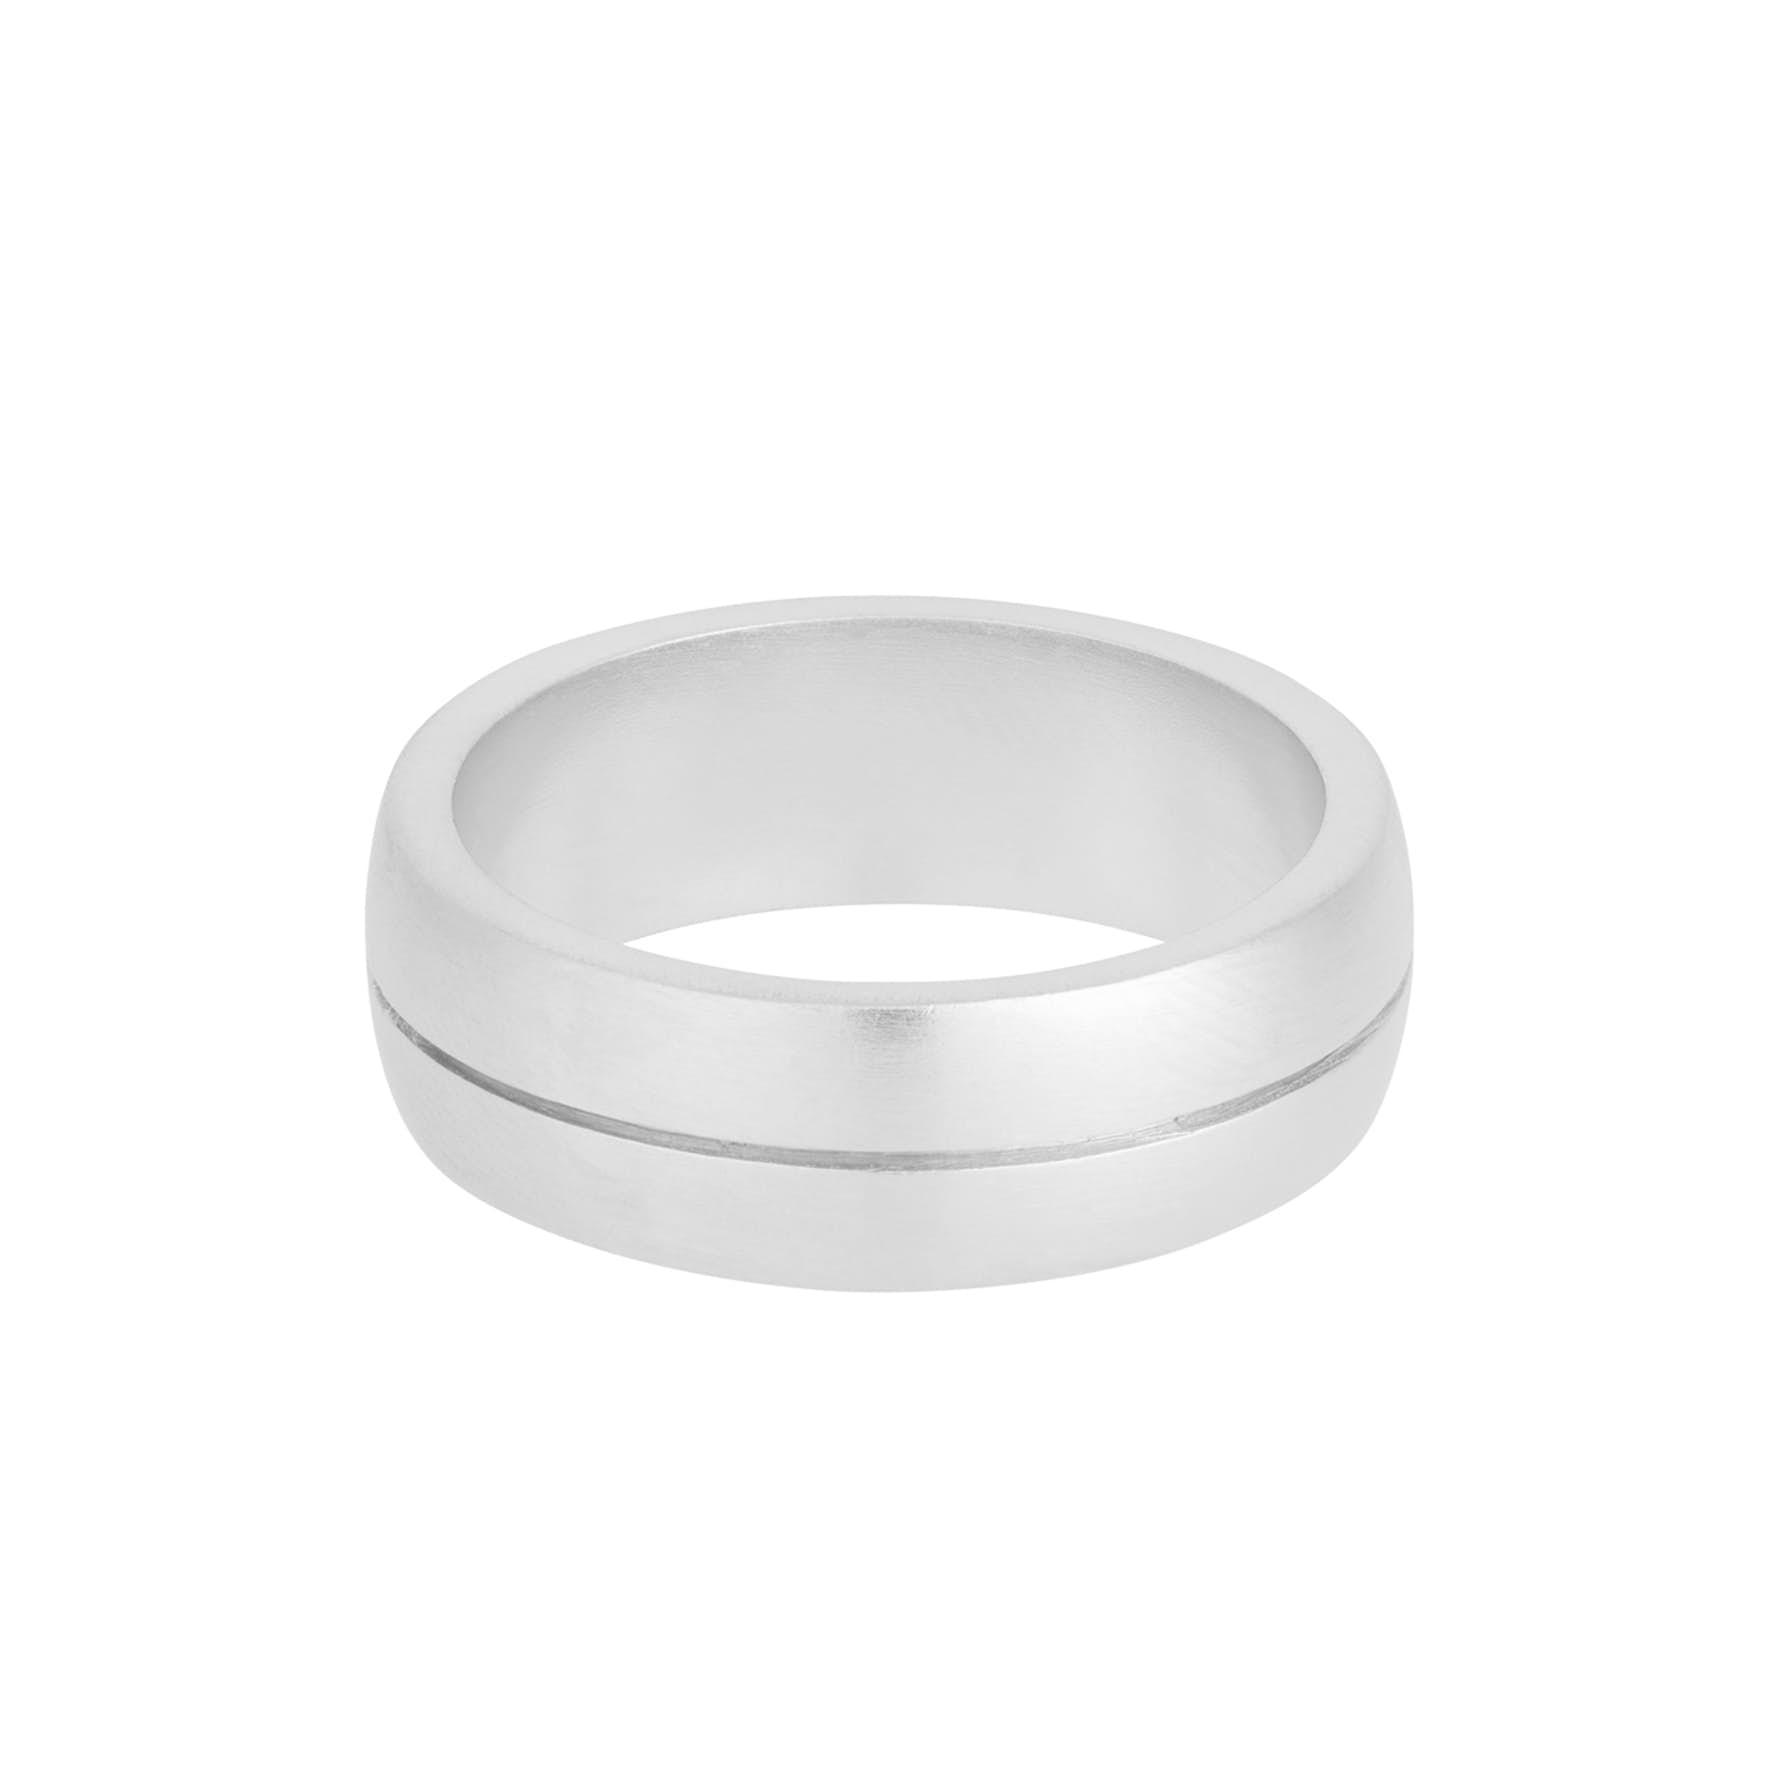 Edge Ring von Pernille Corydon in Silber Sterling 925